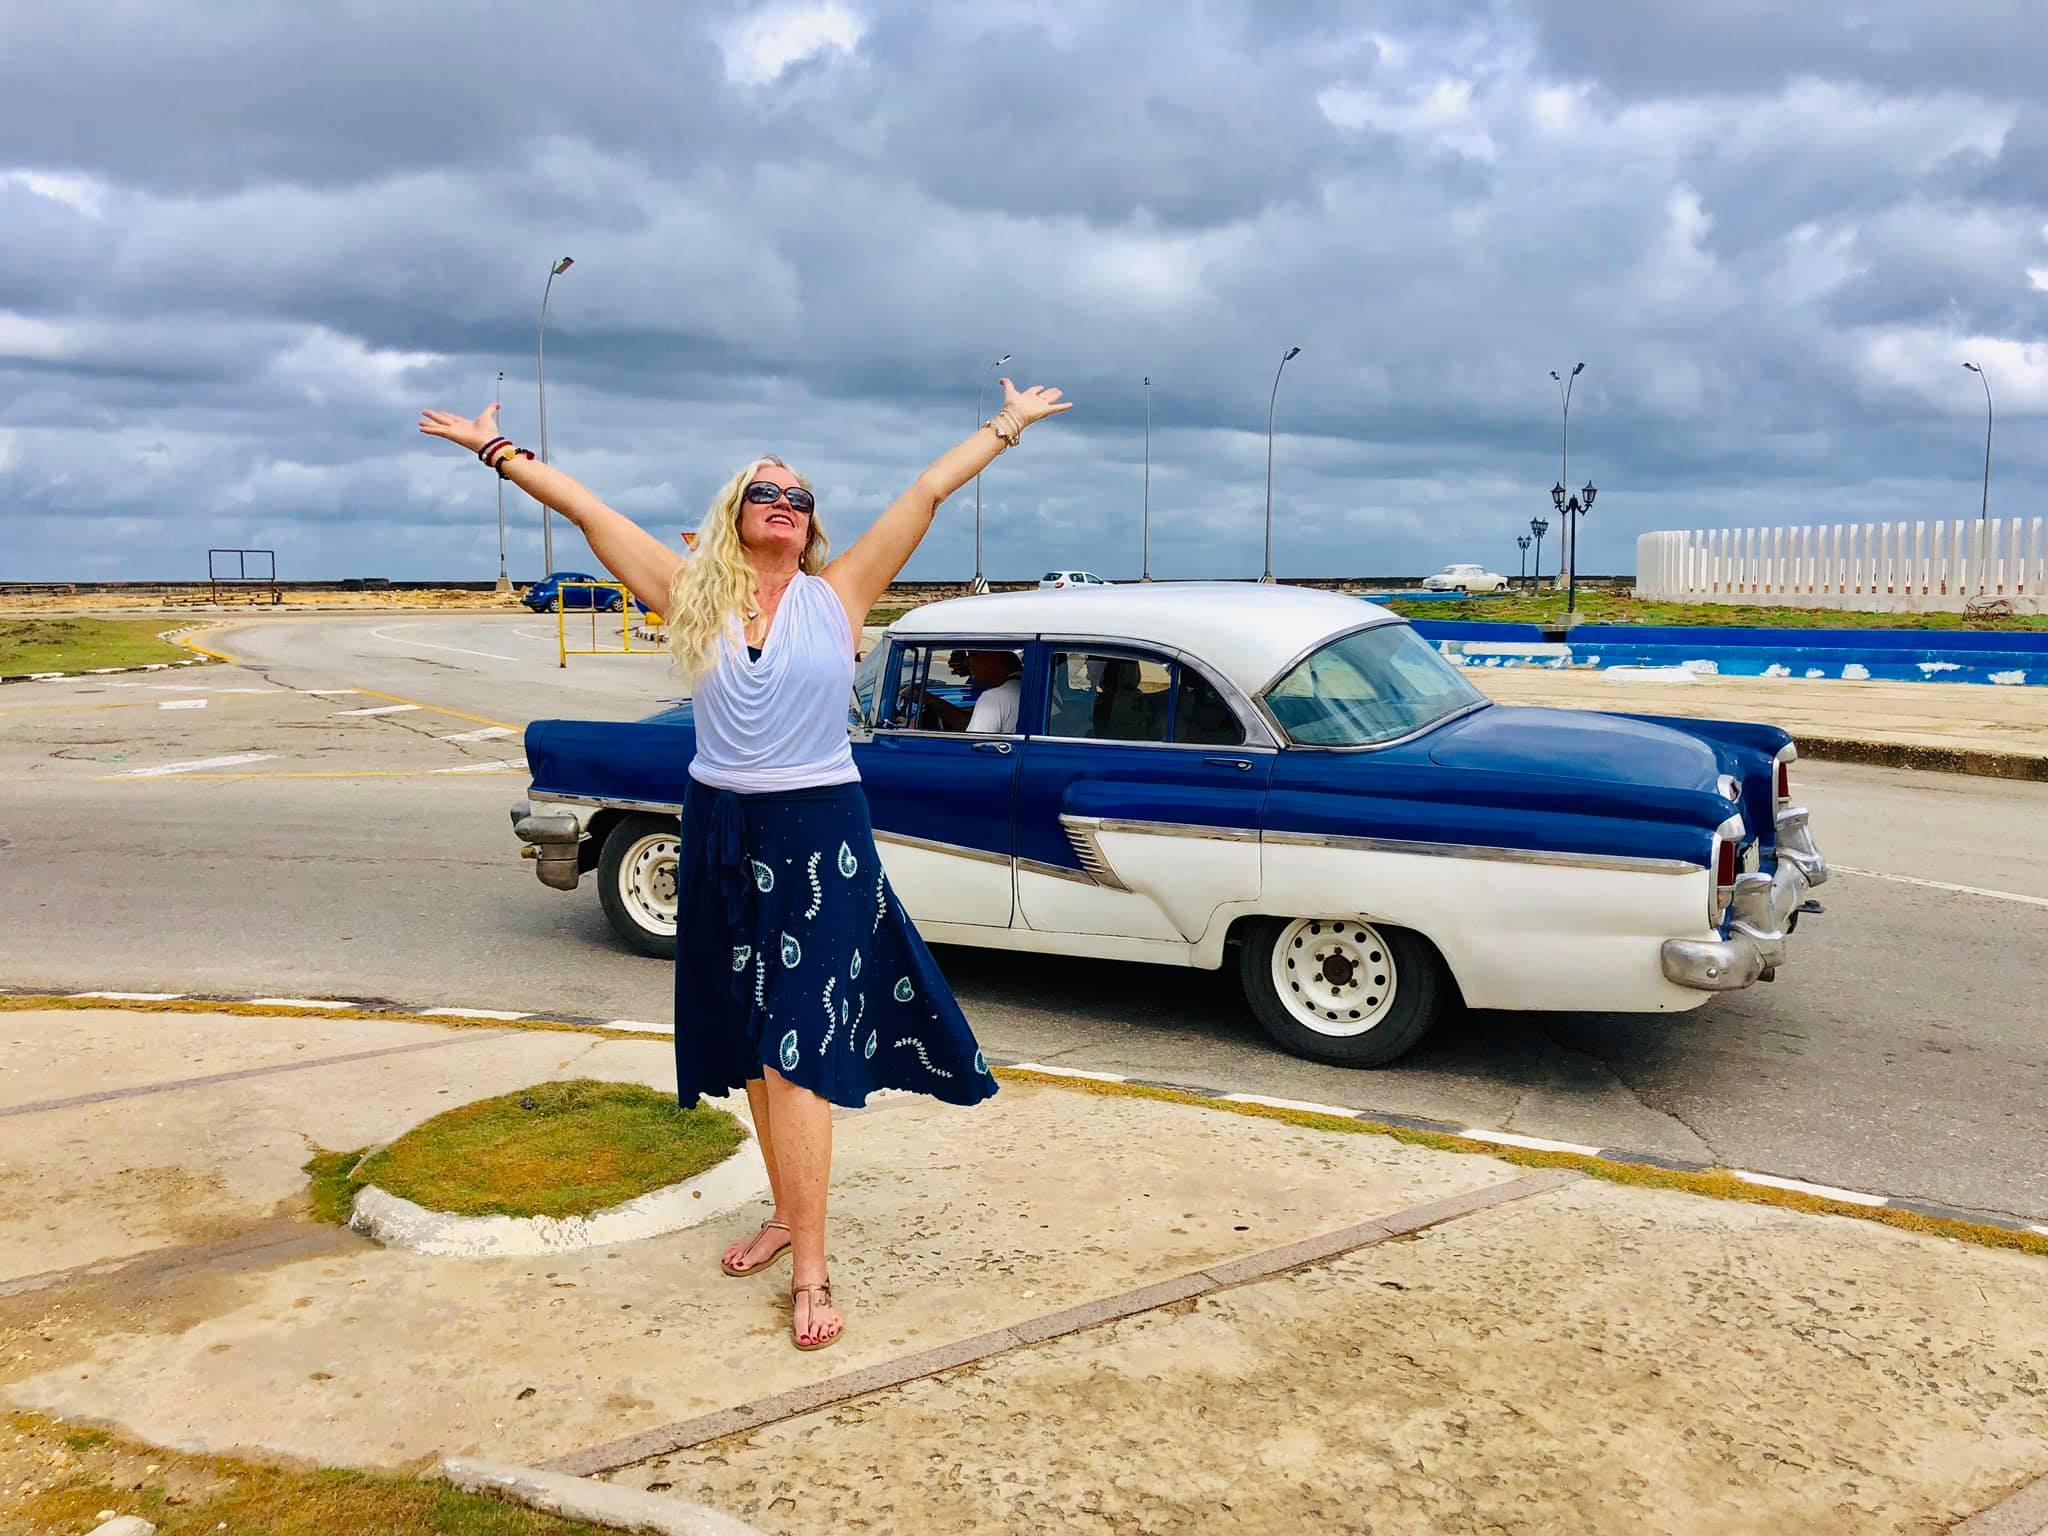 Rosa during the Cuba 2019 trip